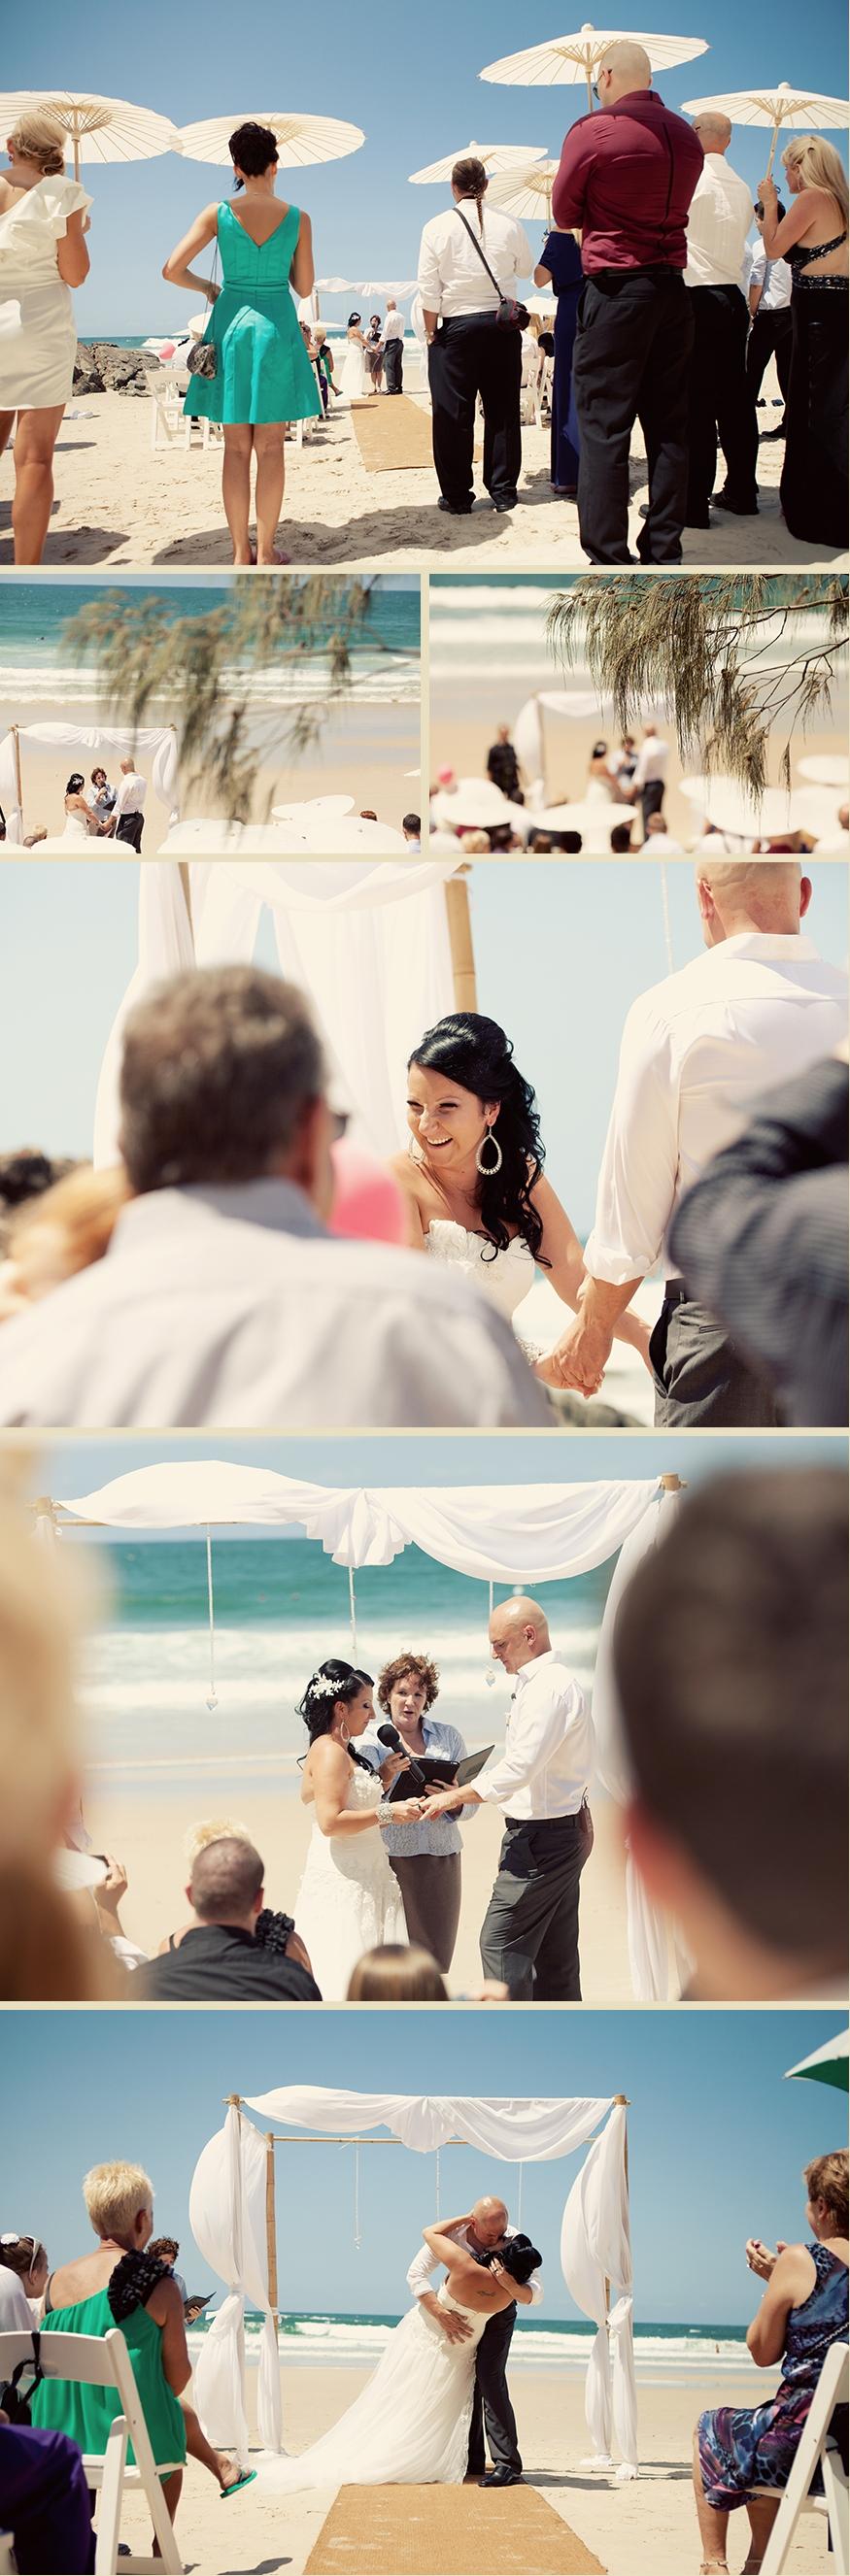 Brisbane Wedding Phoographer Blog collage-1329890858945